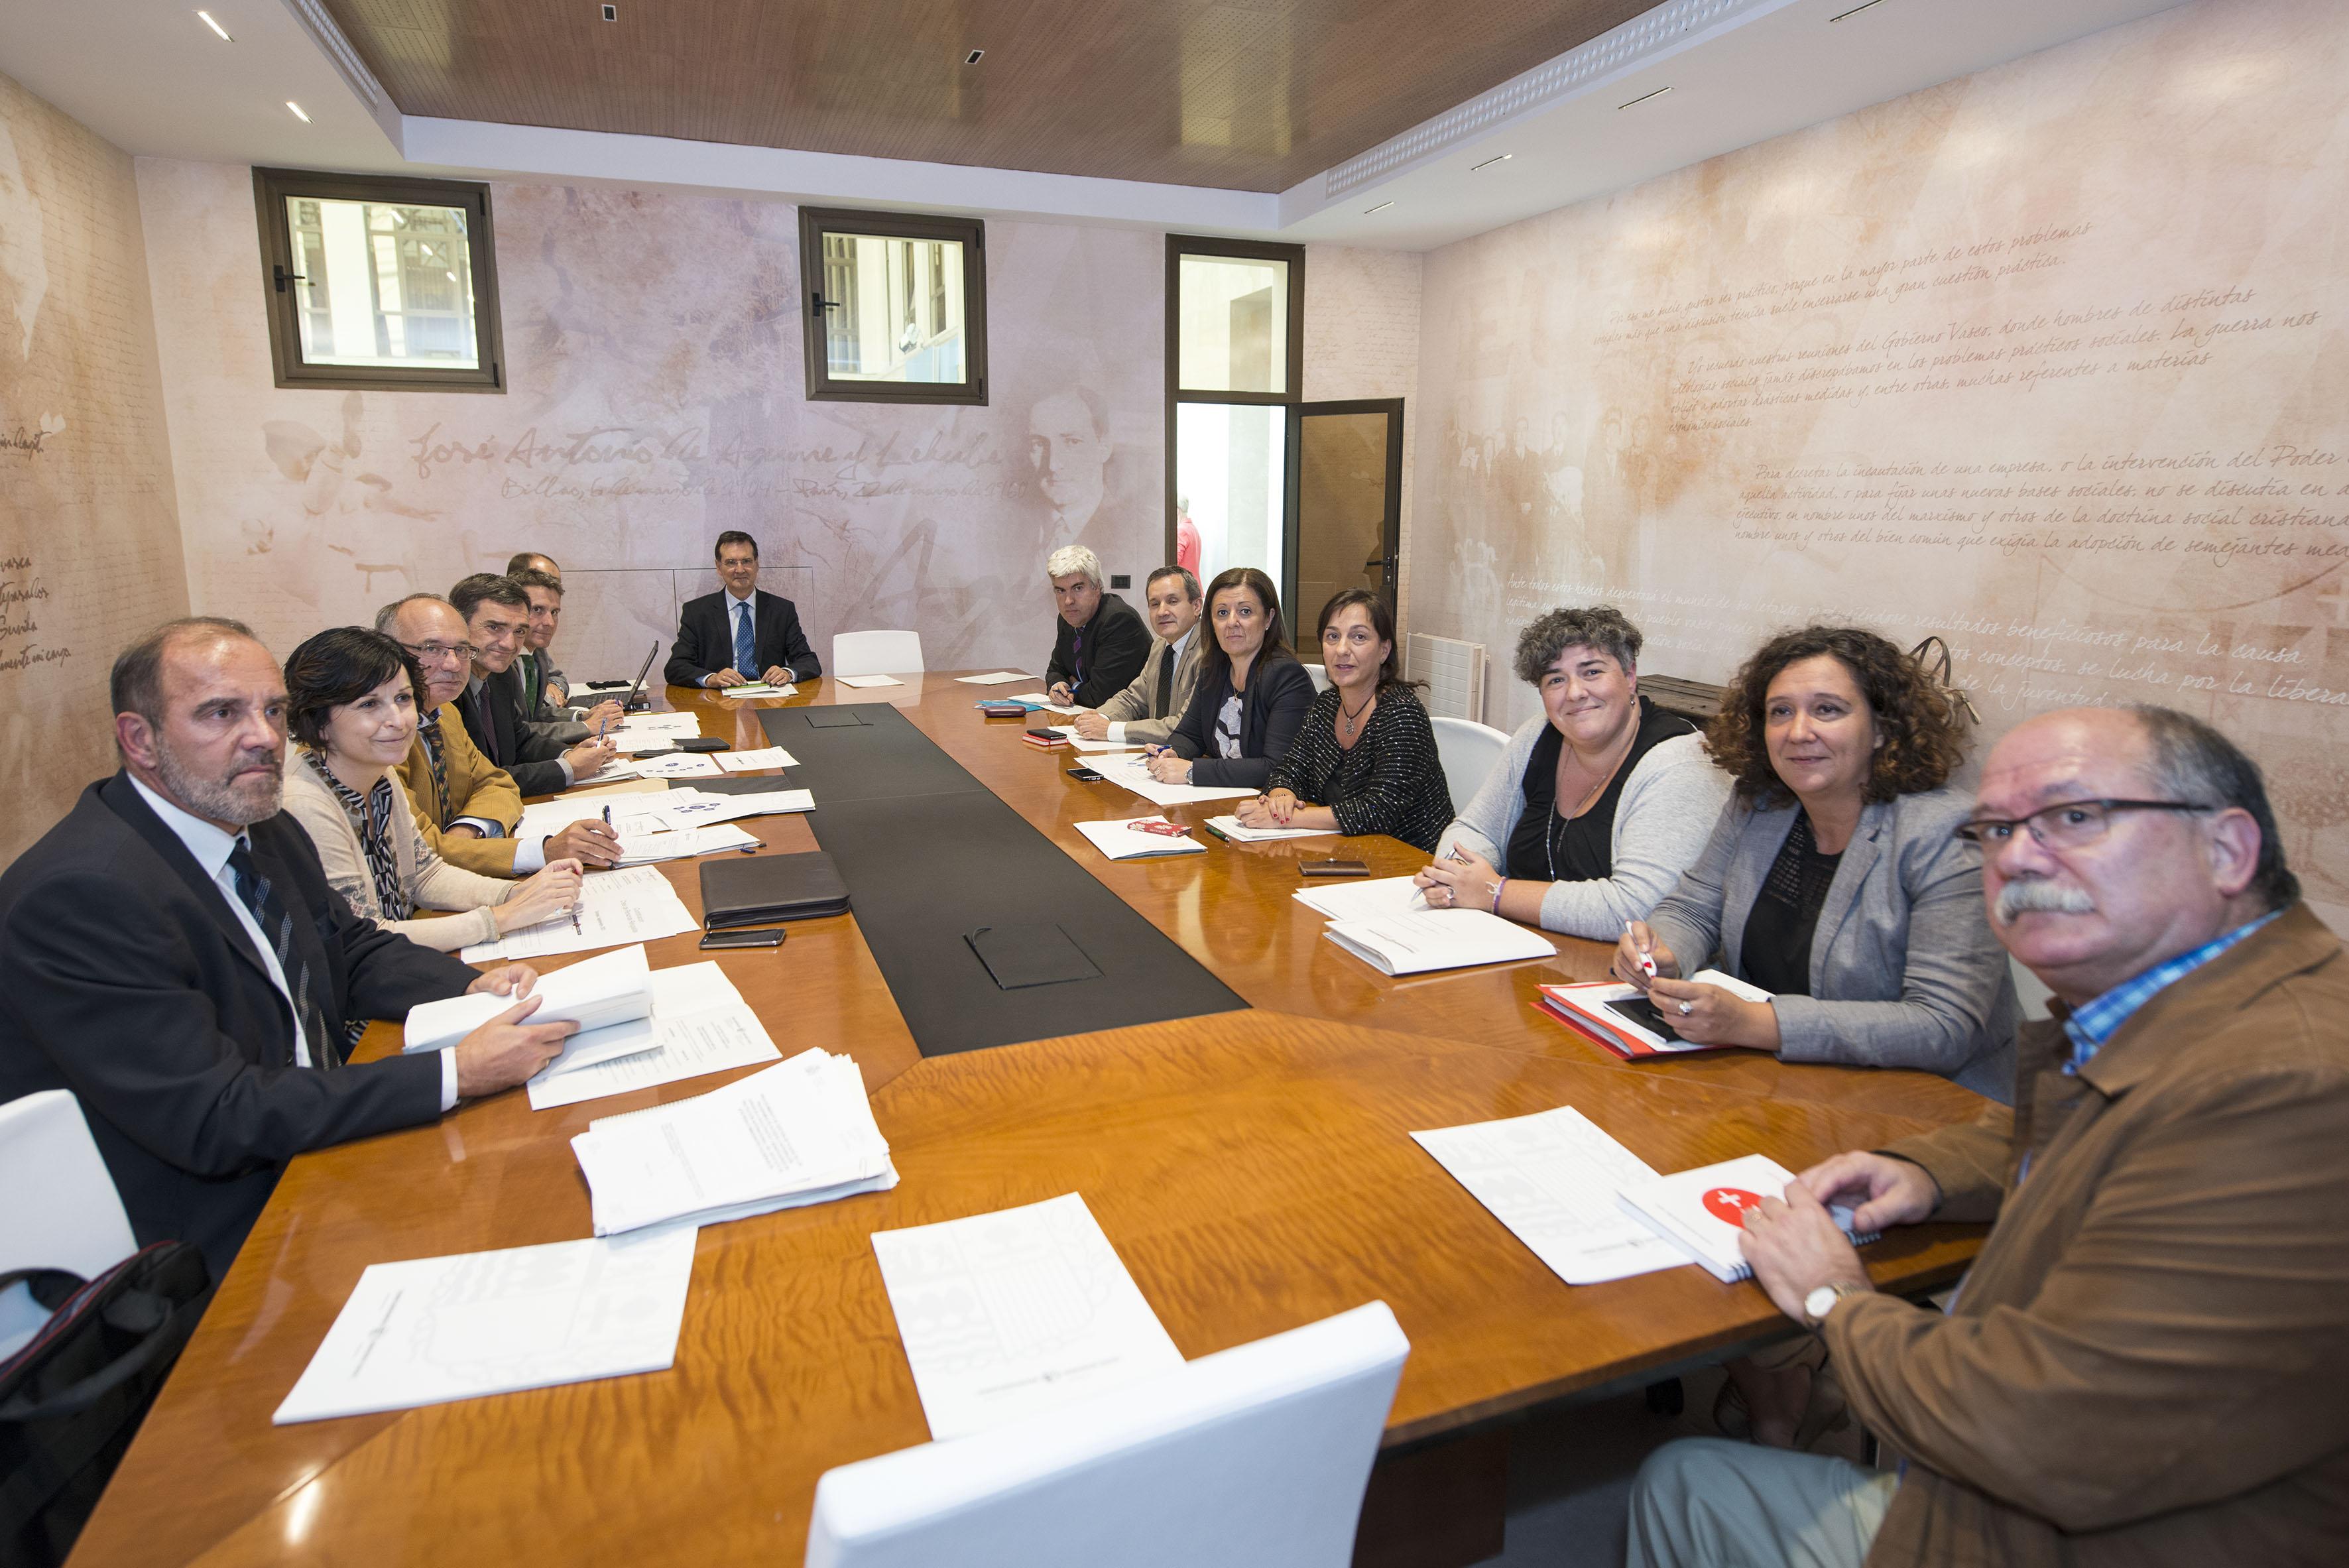 comision_interdepartamental_refugiados_02.jpg